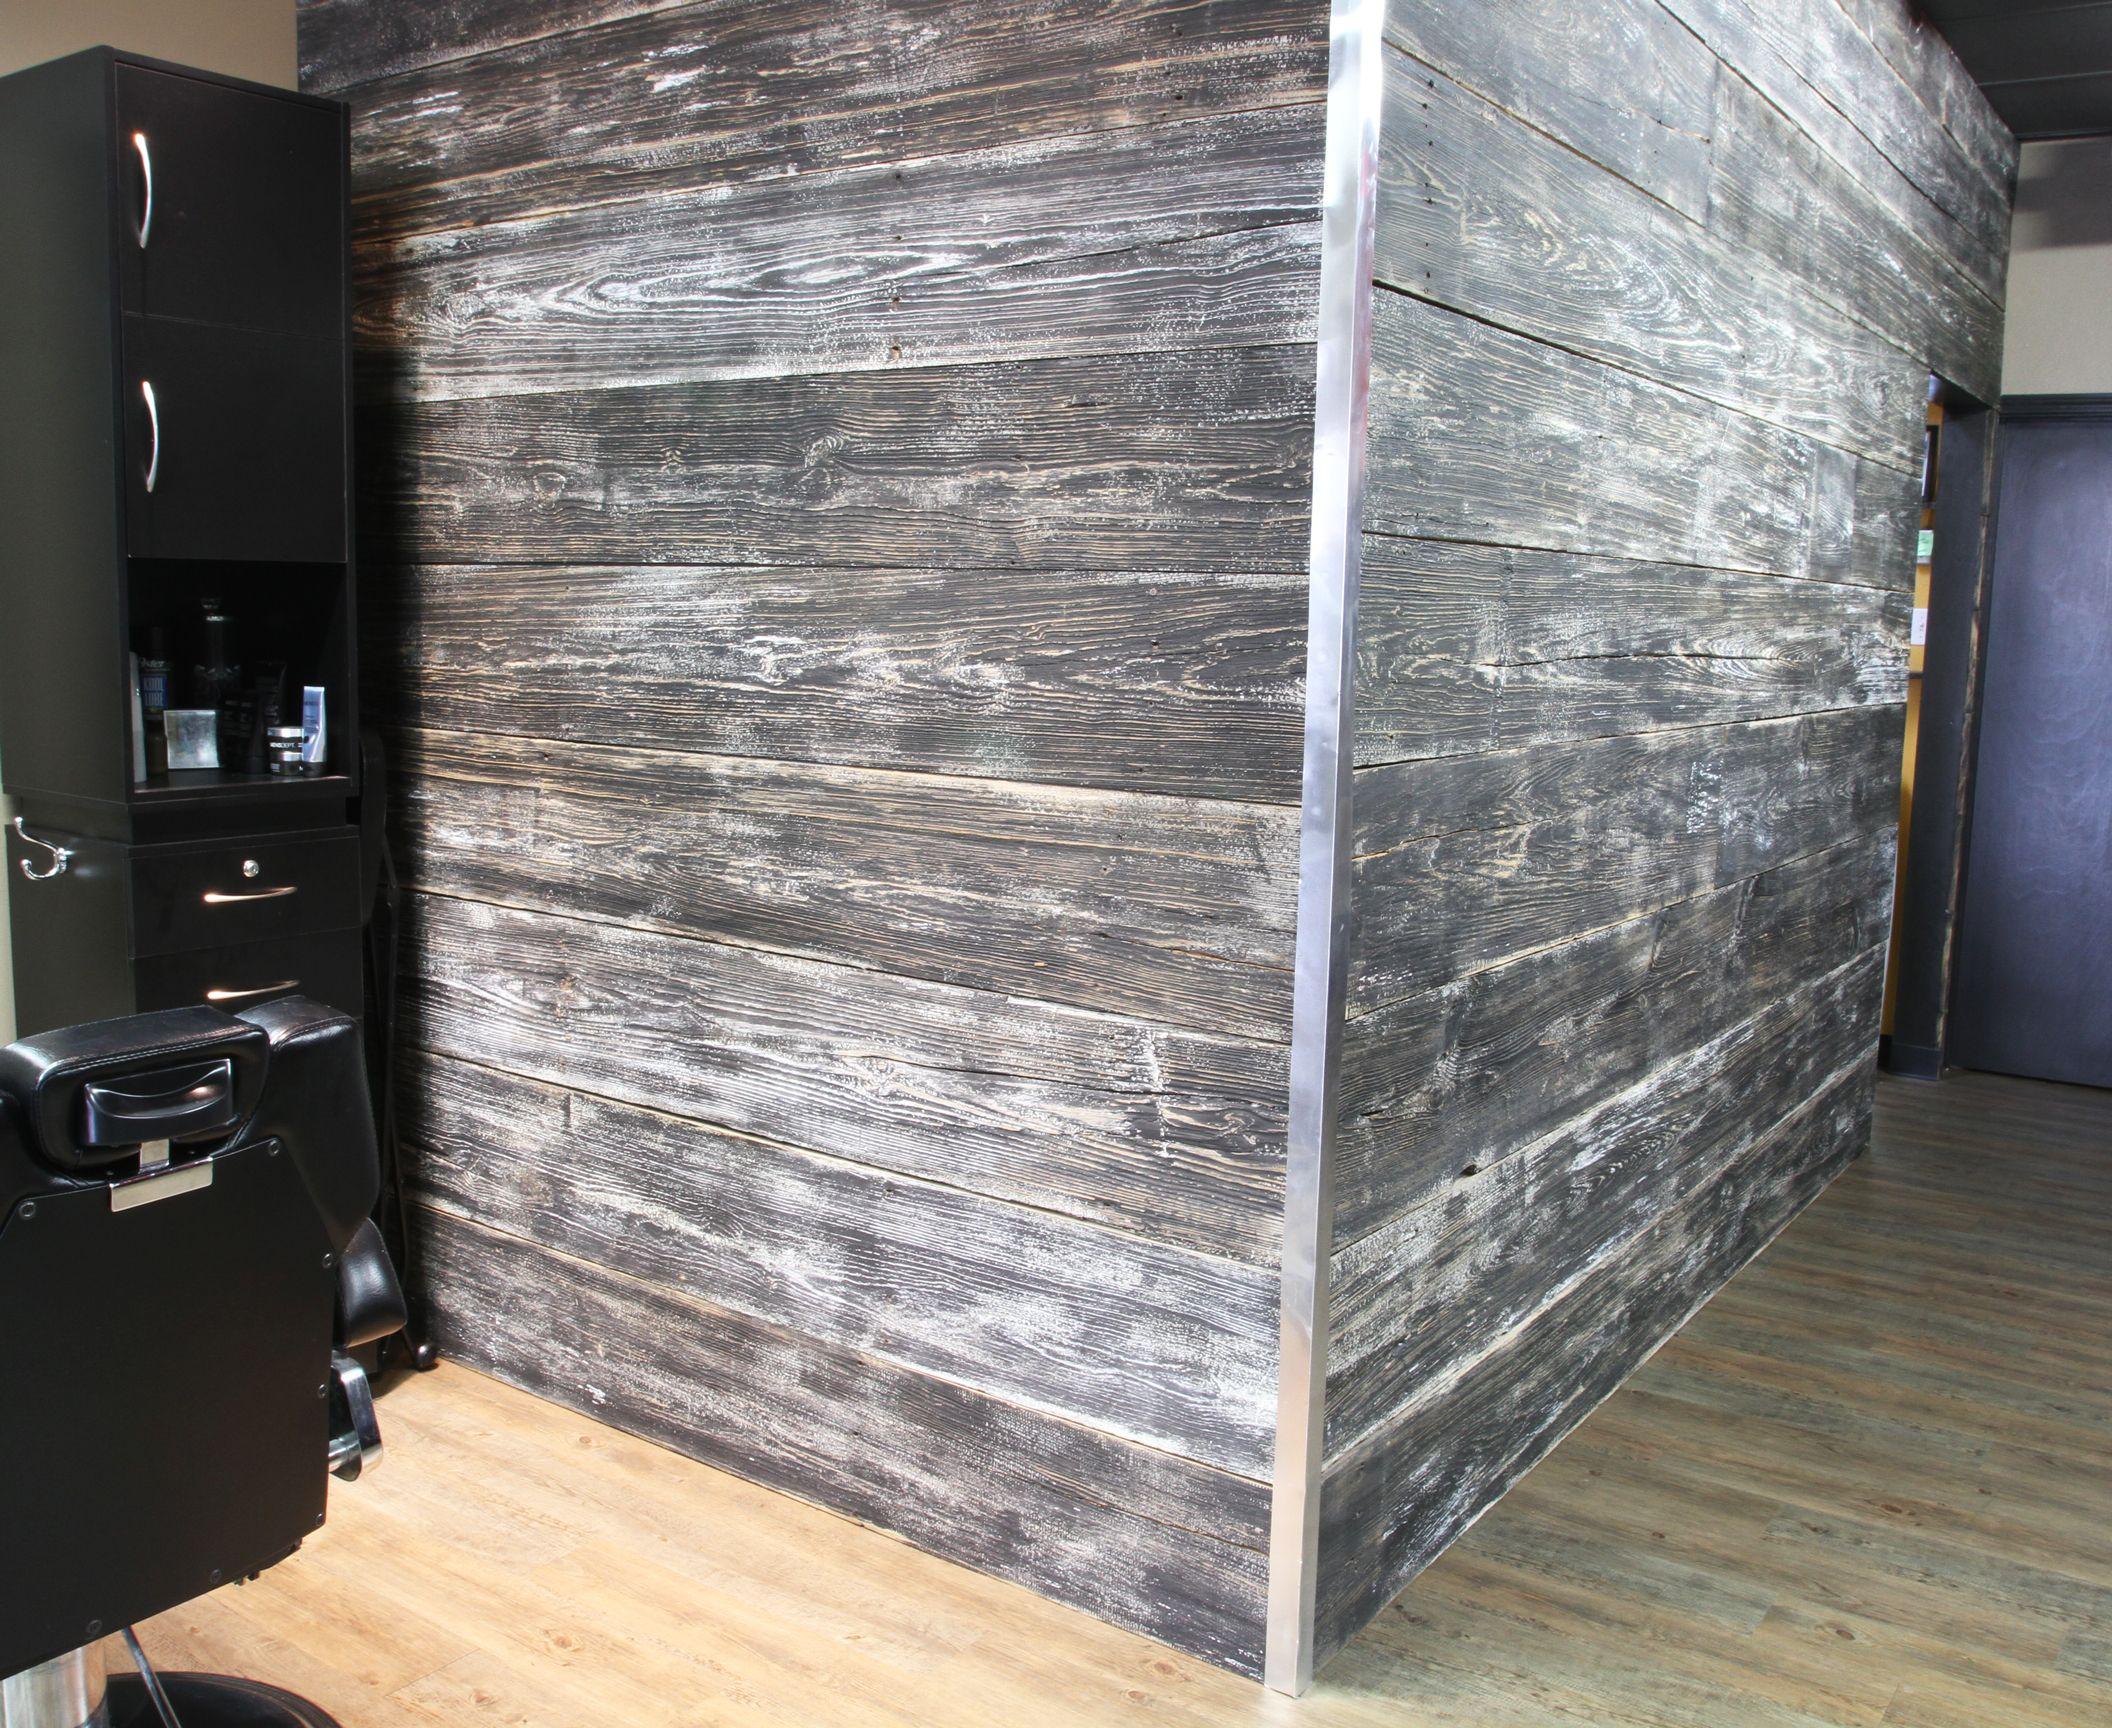 Reclaimed 1x12 Barn Siding Accent Wall Barn Siding Accent Wall Decor